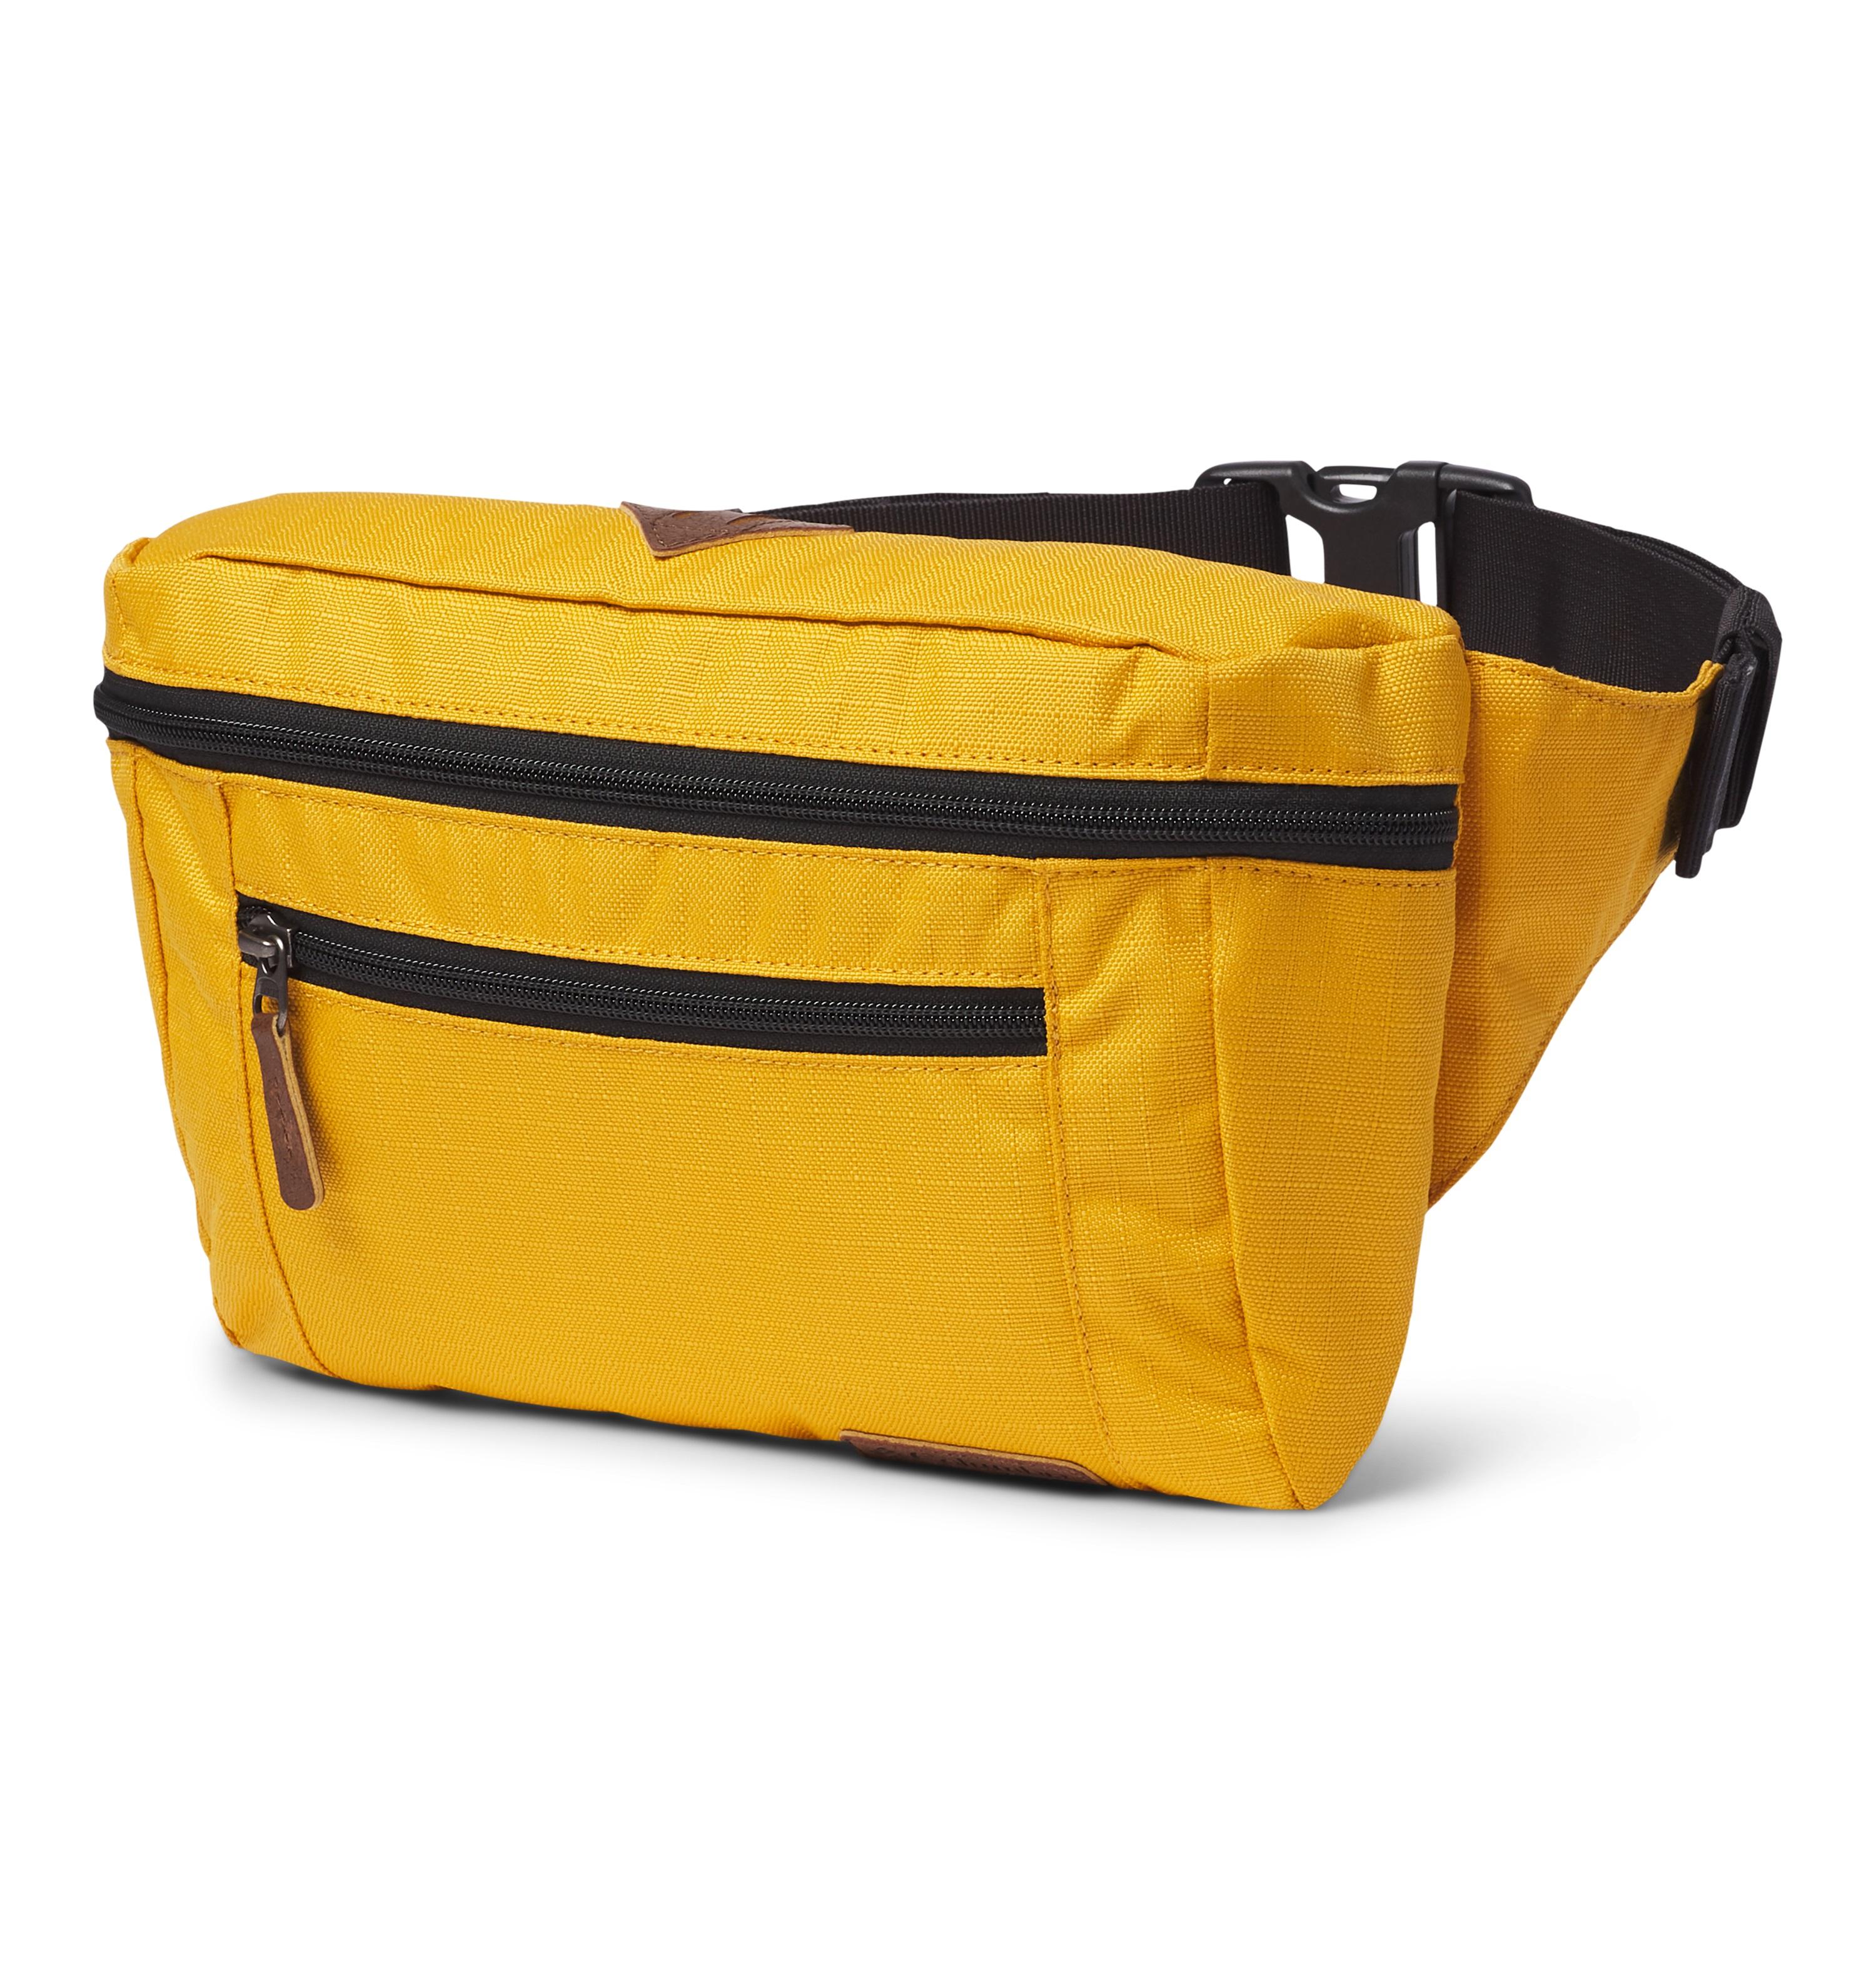 Comprar Columbia Classic Outdoor Bum Bag amarelo